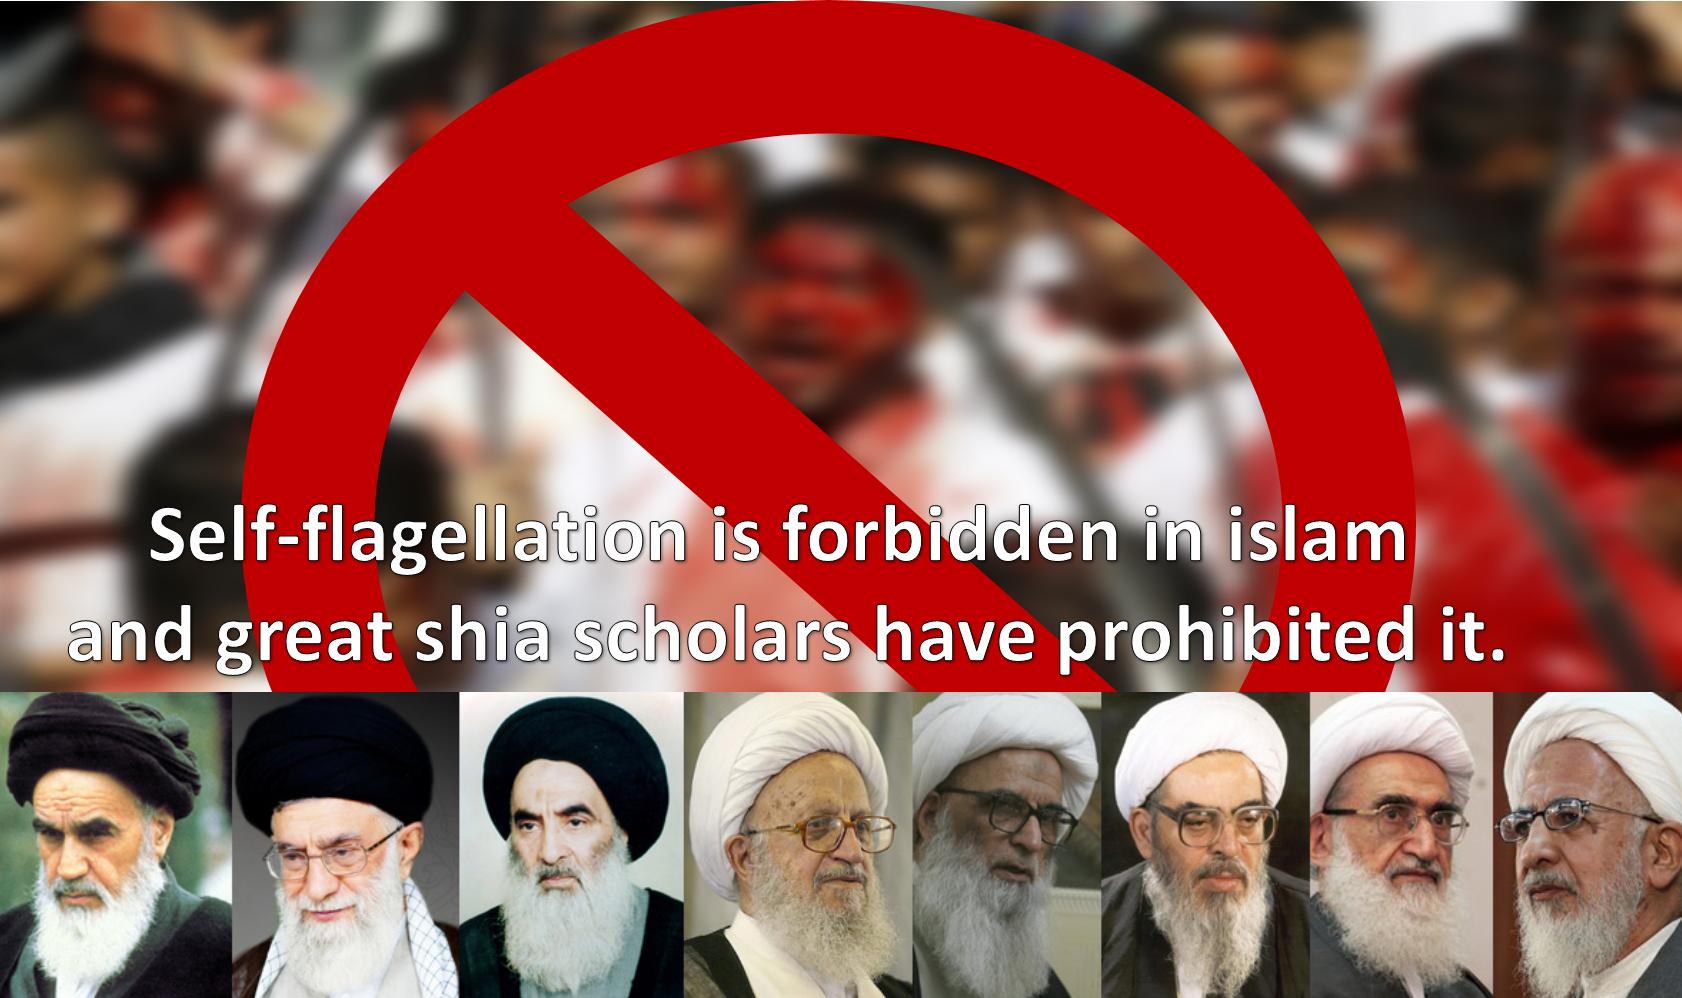 Day of ashura- Ashura self-flagellation is forbidden in Islam